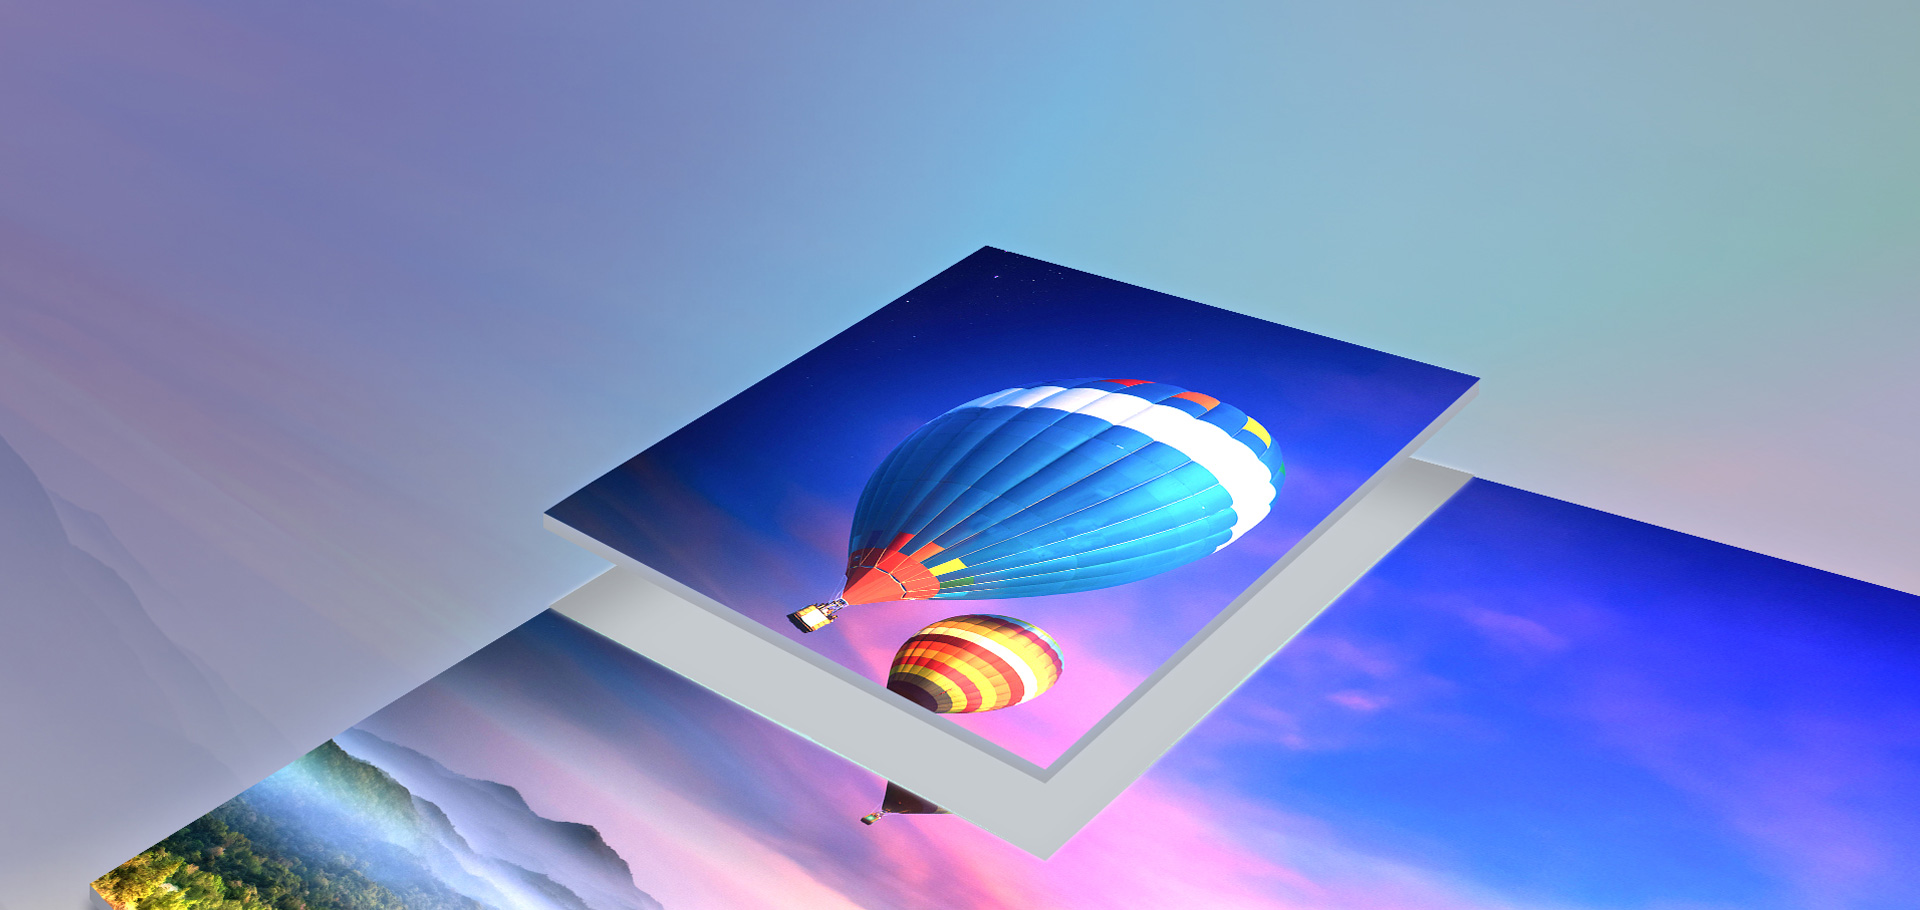 HD Display, Seamless Splicing